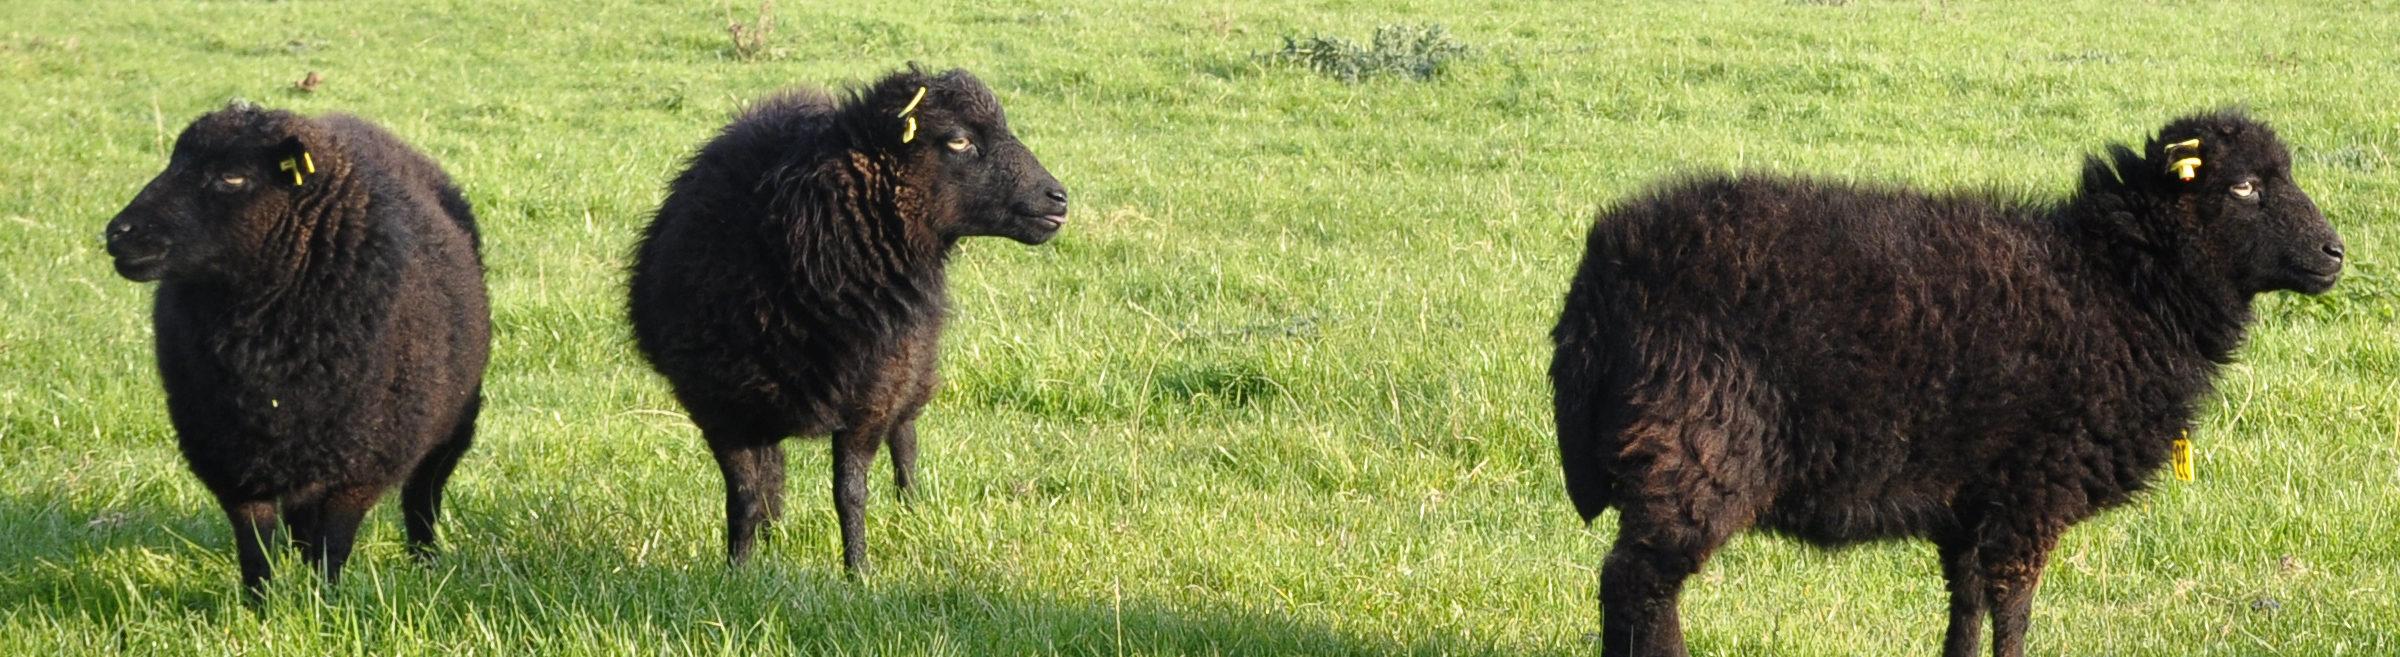 mouton ouessant ecopaturage